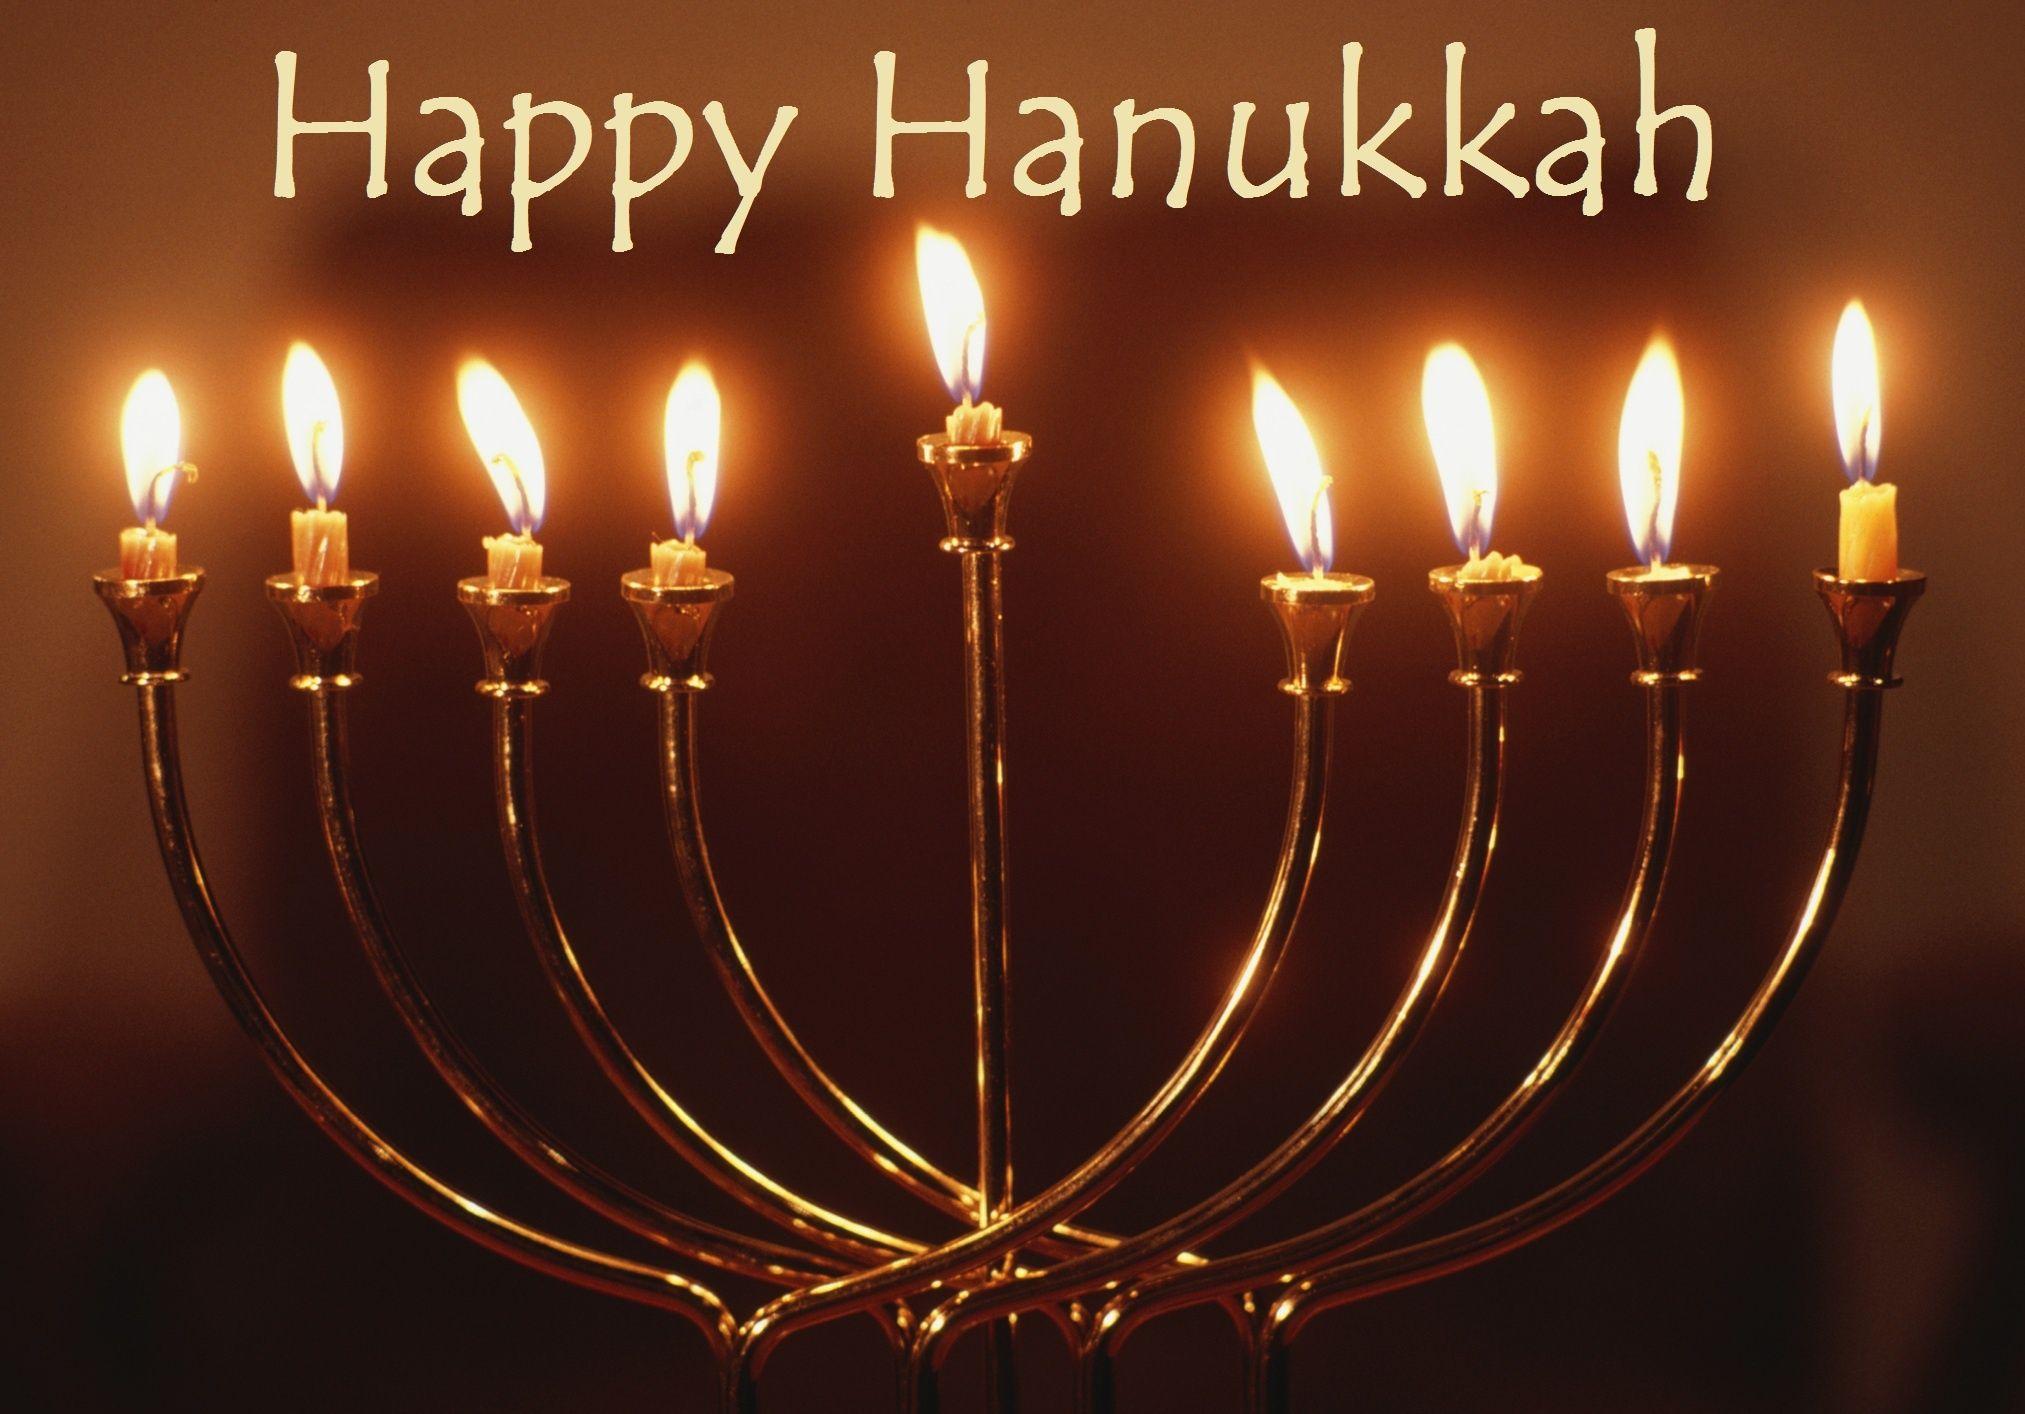 Happy Hanukkah Images Free Happy Hanukkah Images Happy Hanukkah Hanukkah Quote